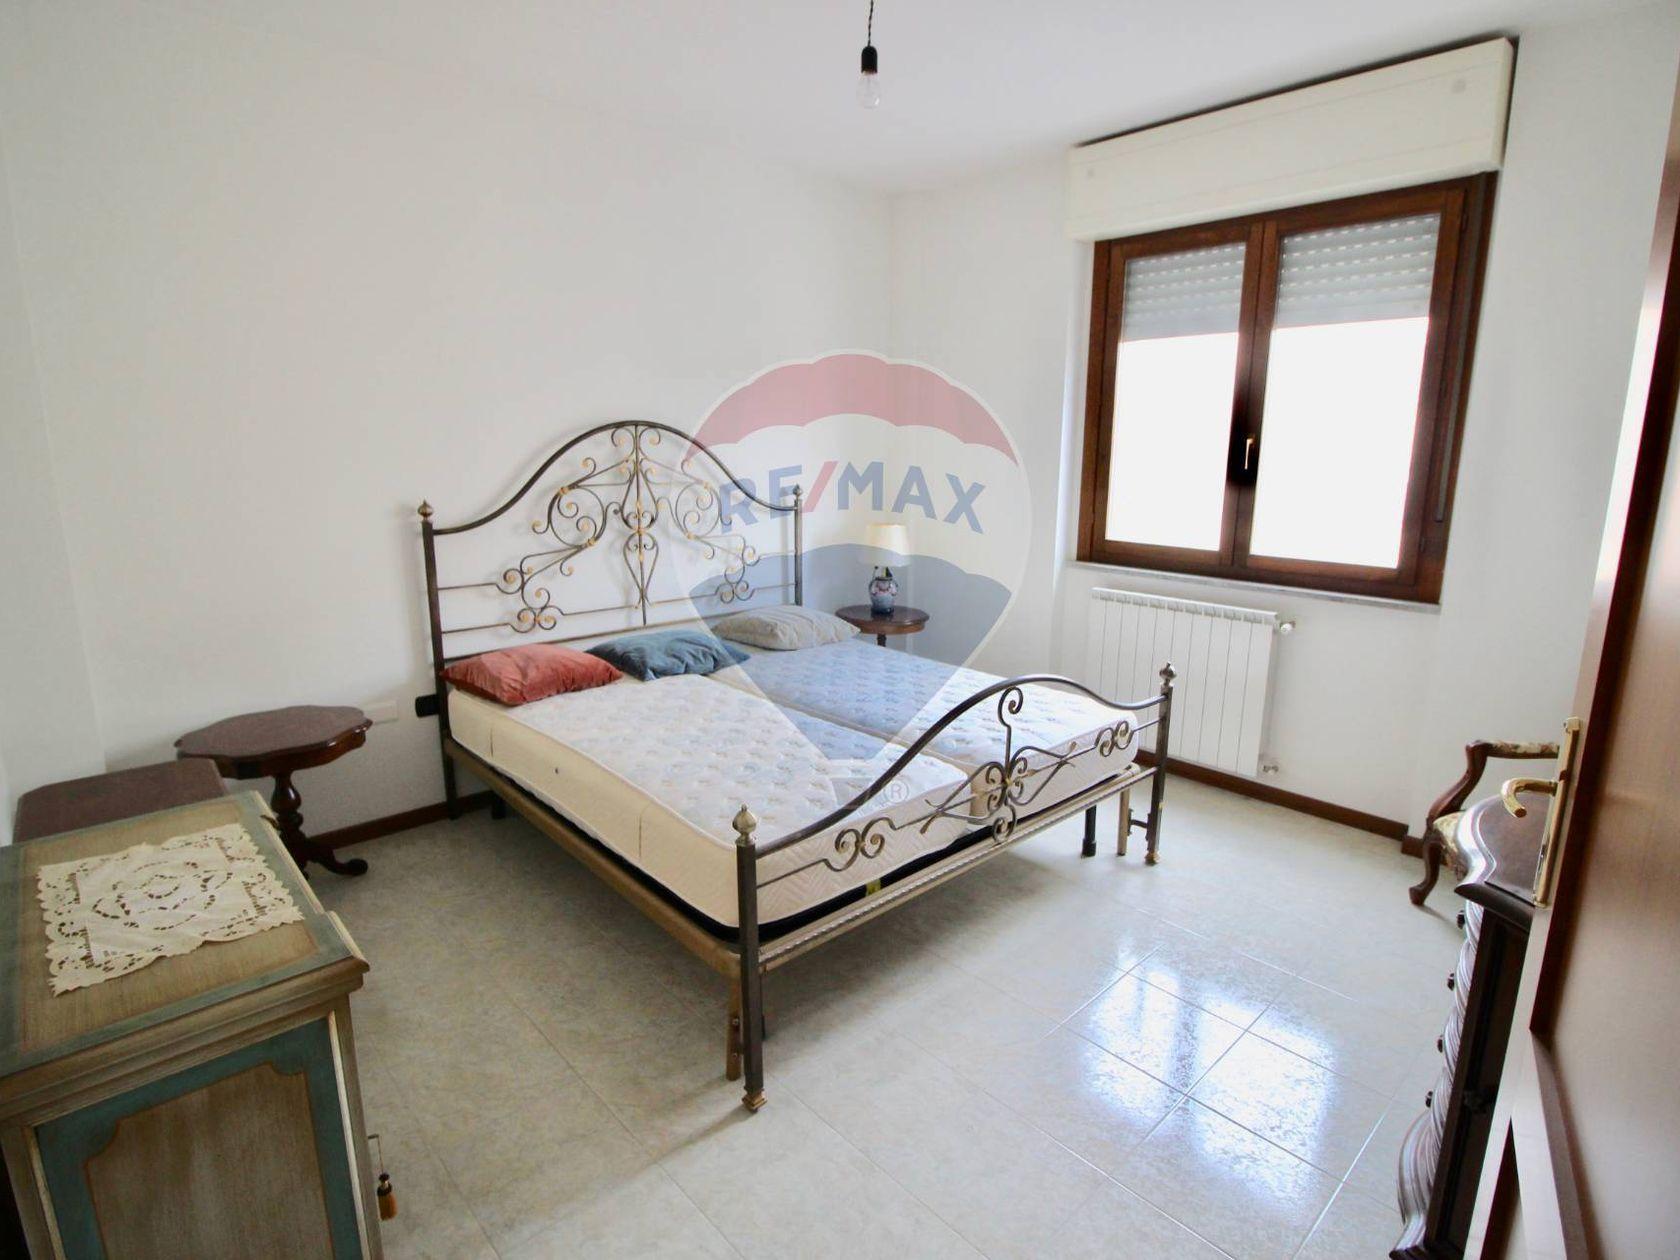 Appartamento Ss-s. Orsola Storica, Sassari, SS Vendita - Foto 11